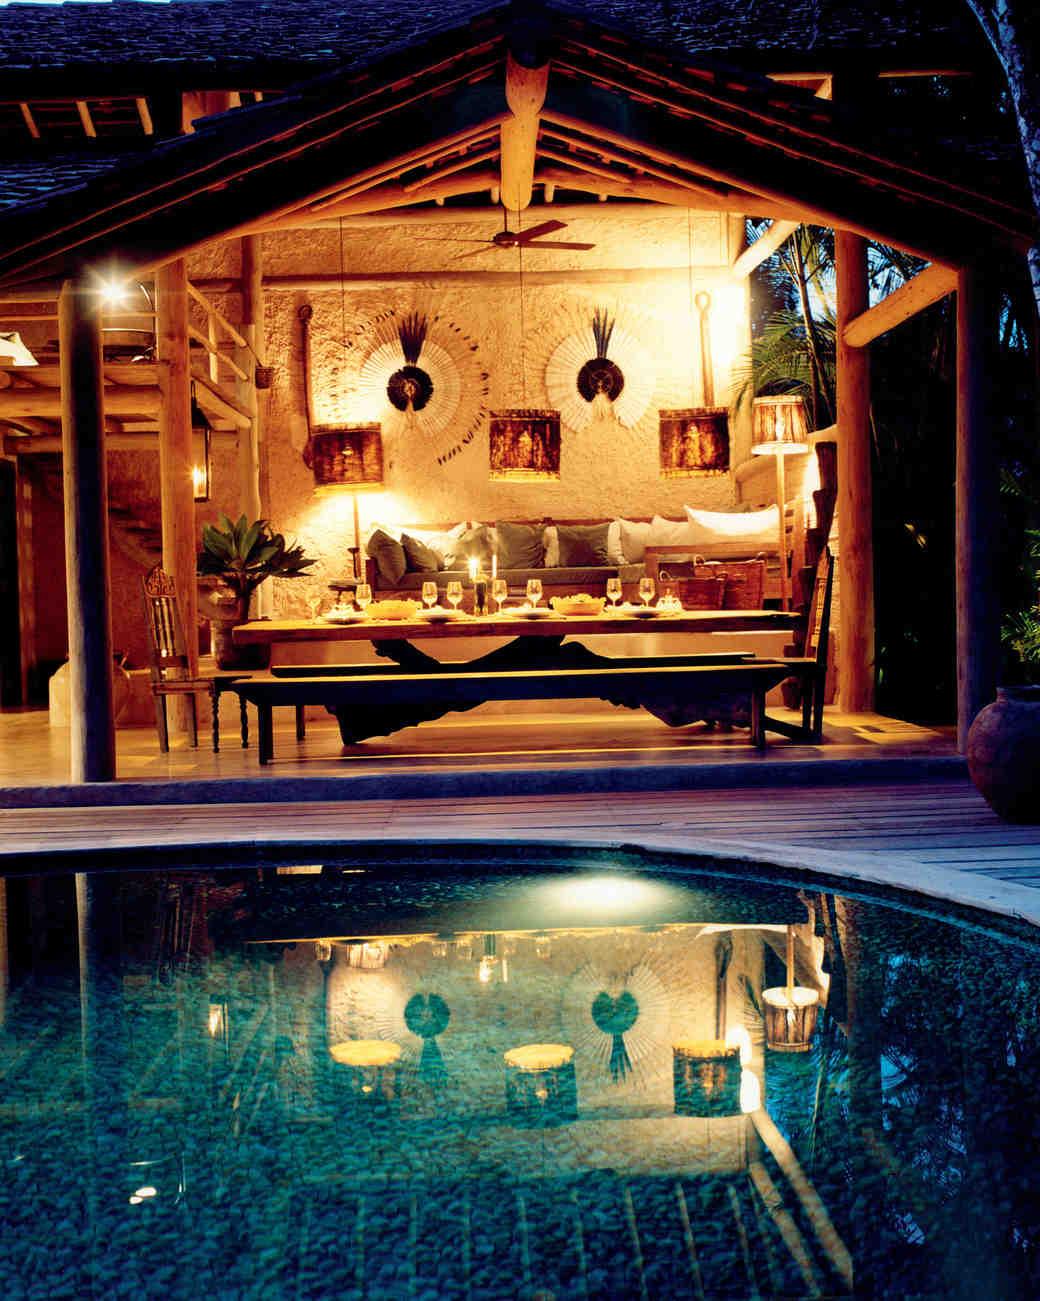 honeymoon-destinations-2015-brazil-uxua-casa-pool-0115.jpg